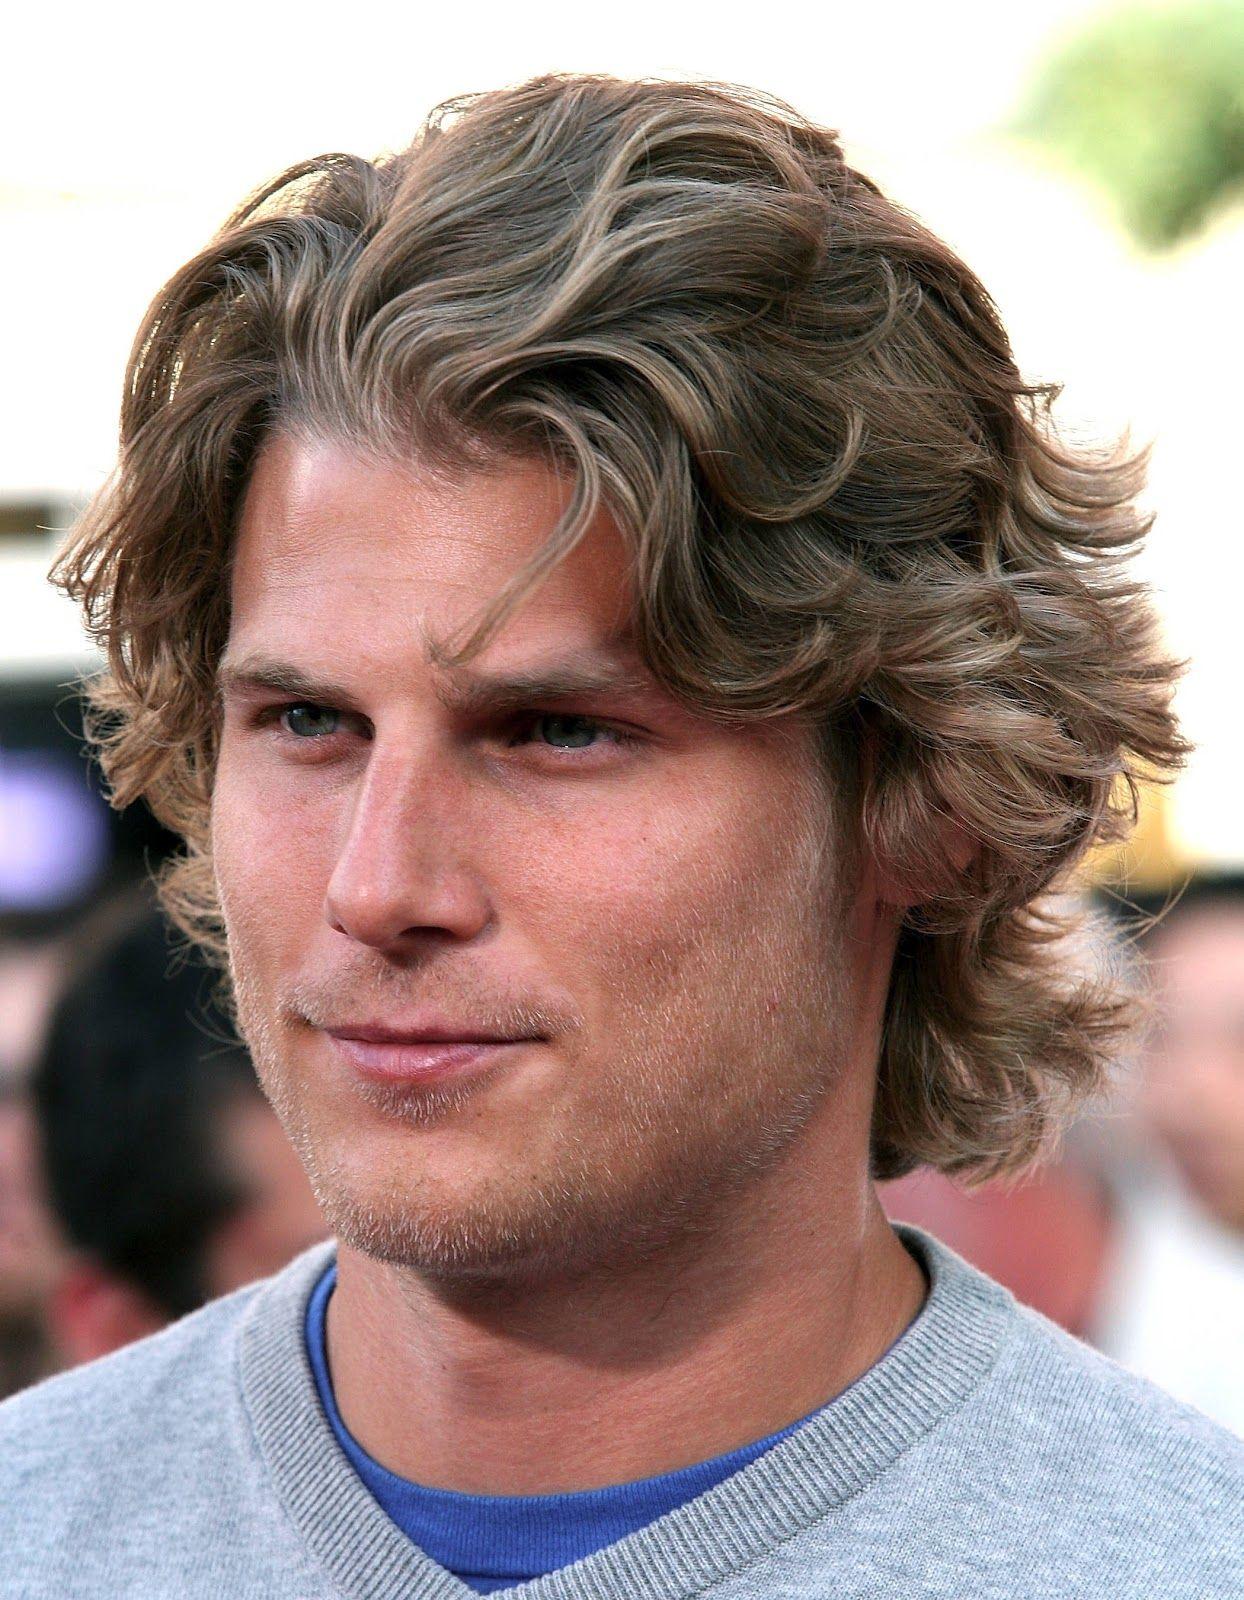 Curly mens haircuts mid length mens hair  google search  hairdo for men  pinterest